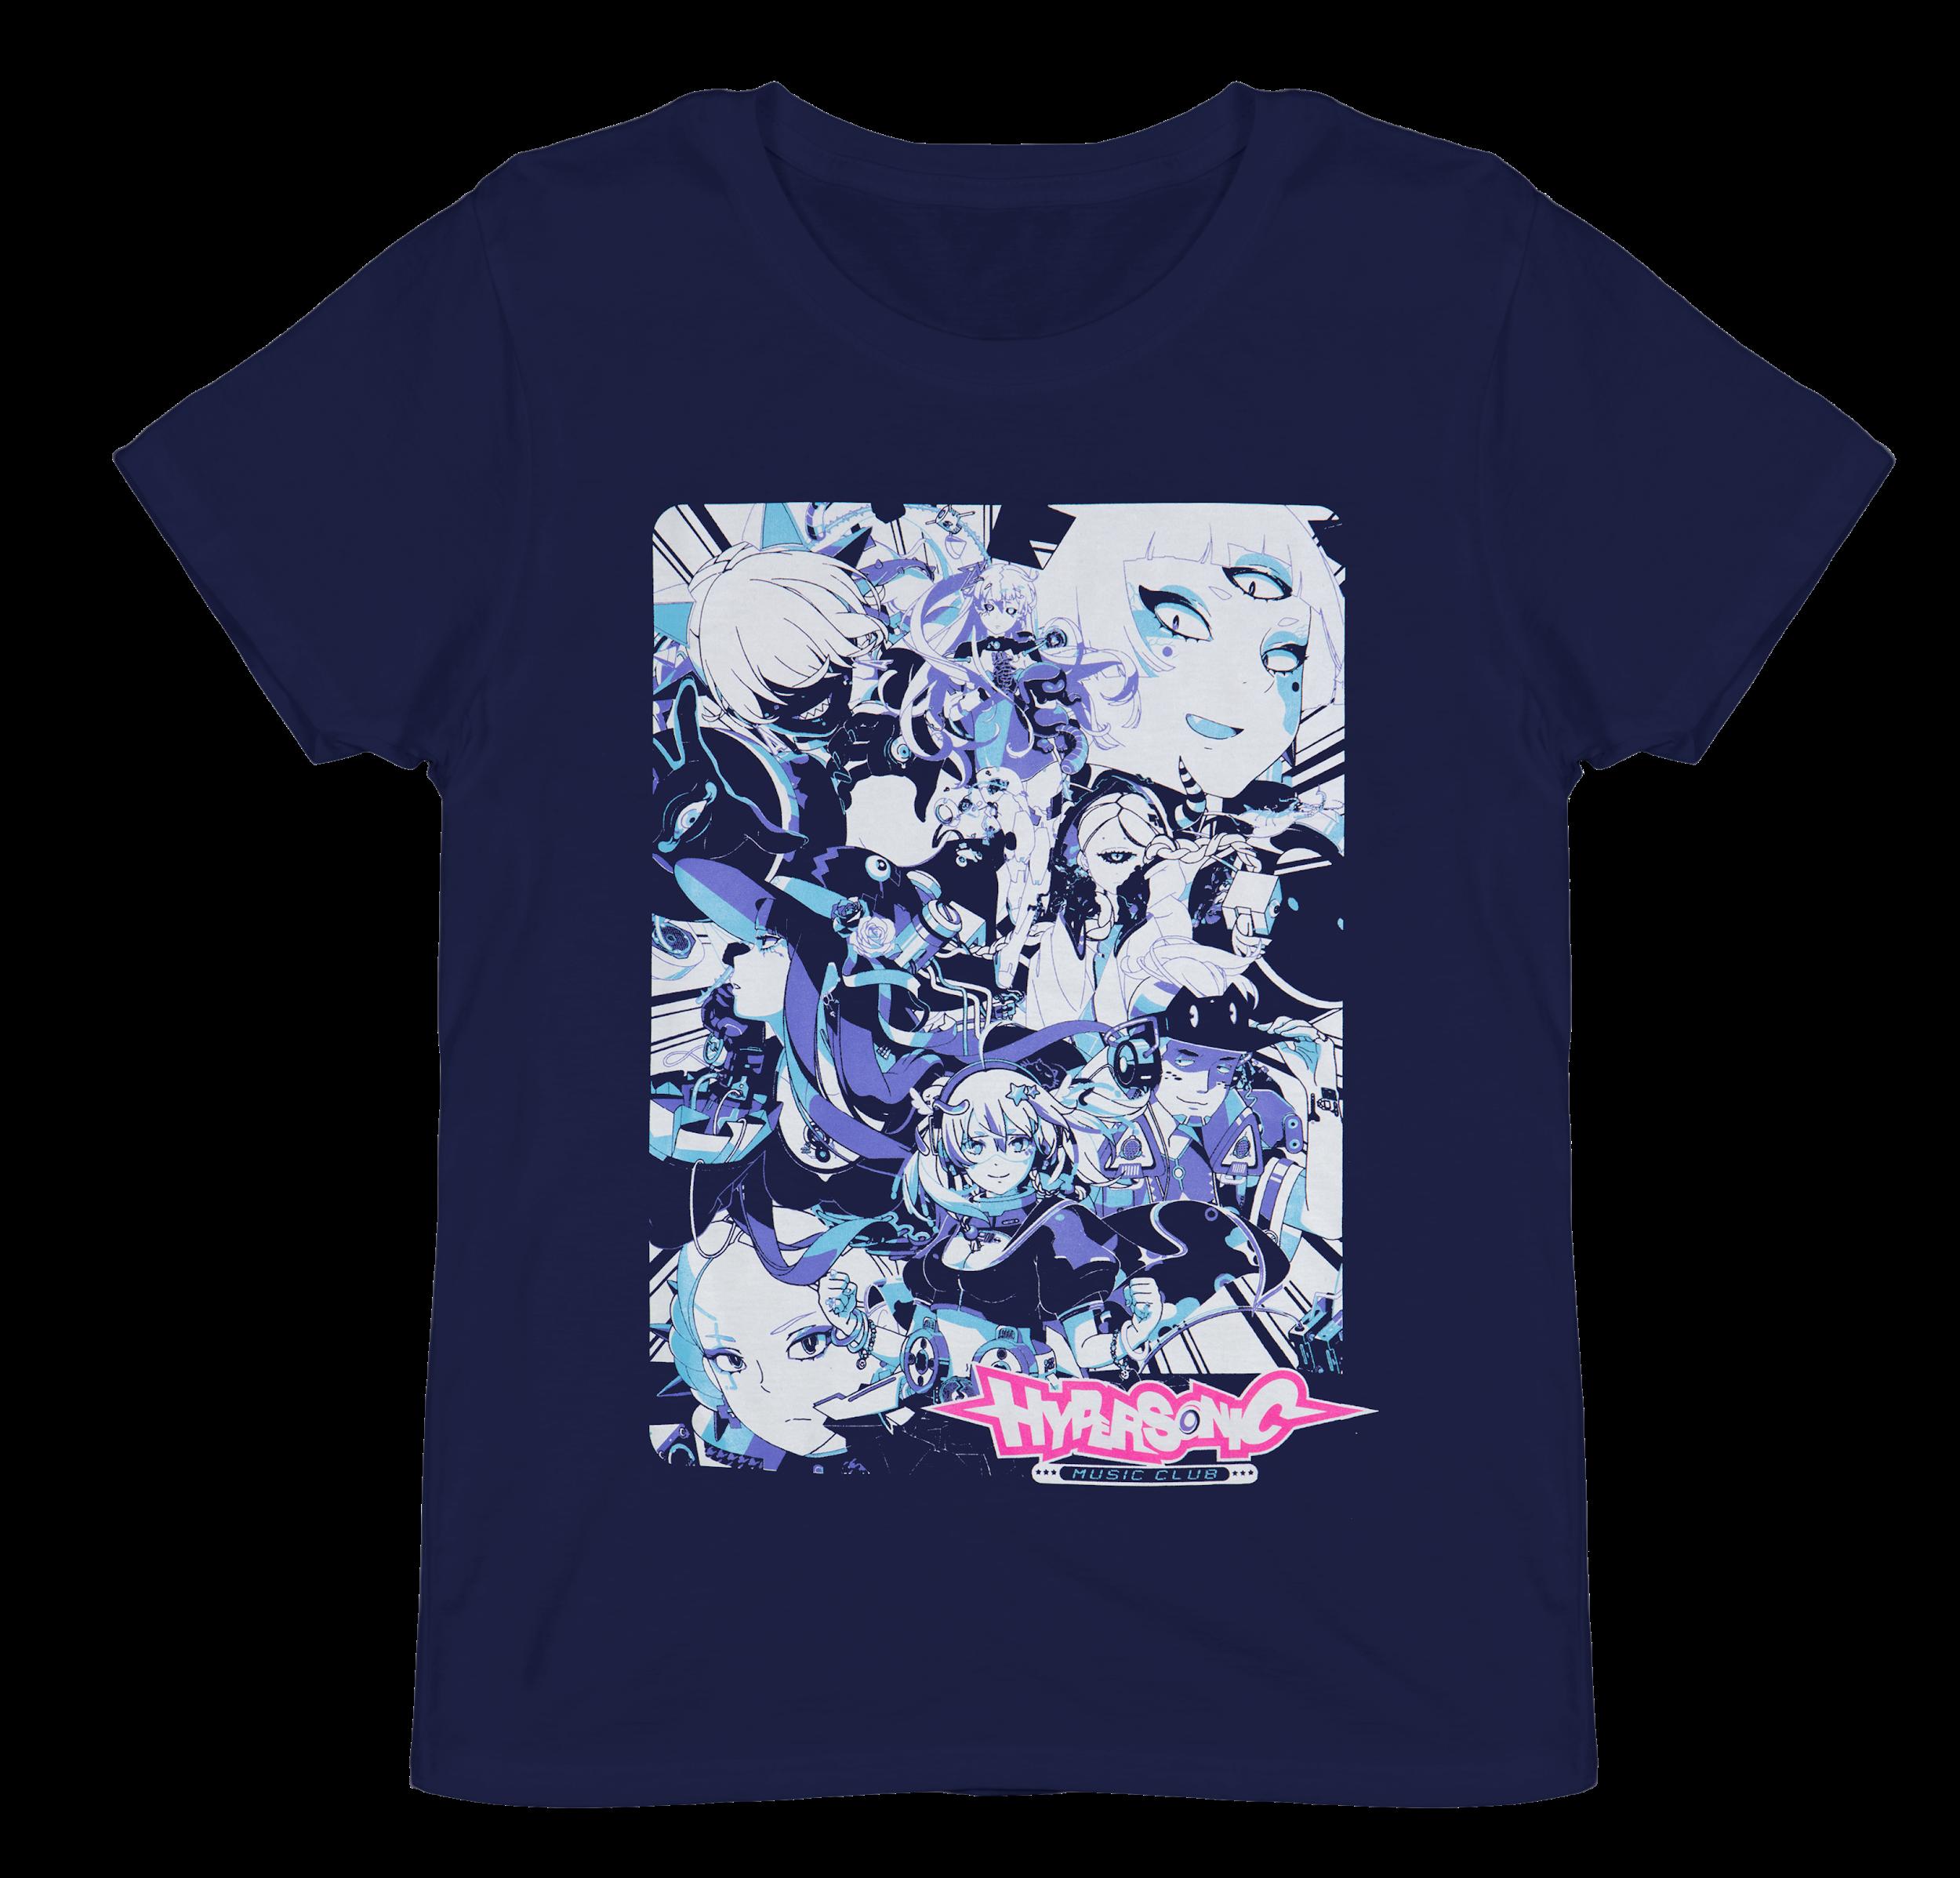 Hyper Sonic Club Music T Shirt | Loot Crate